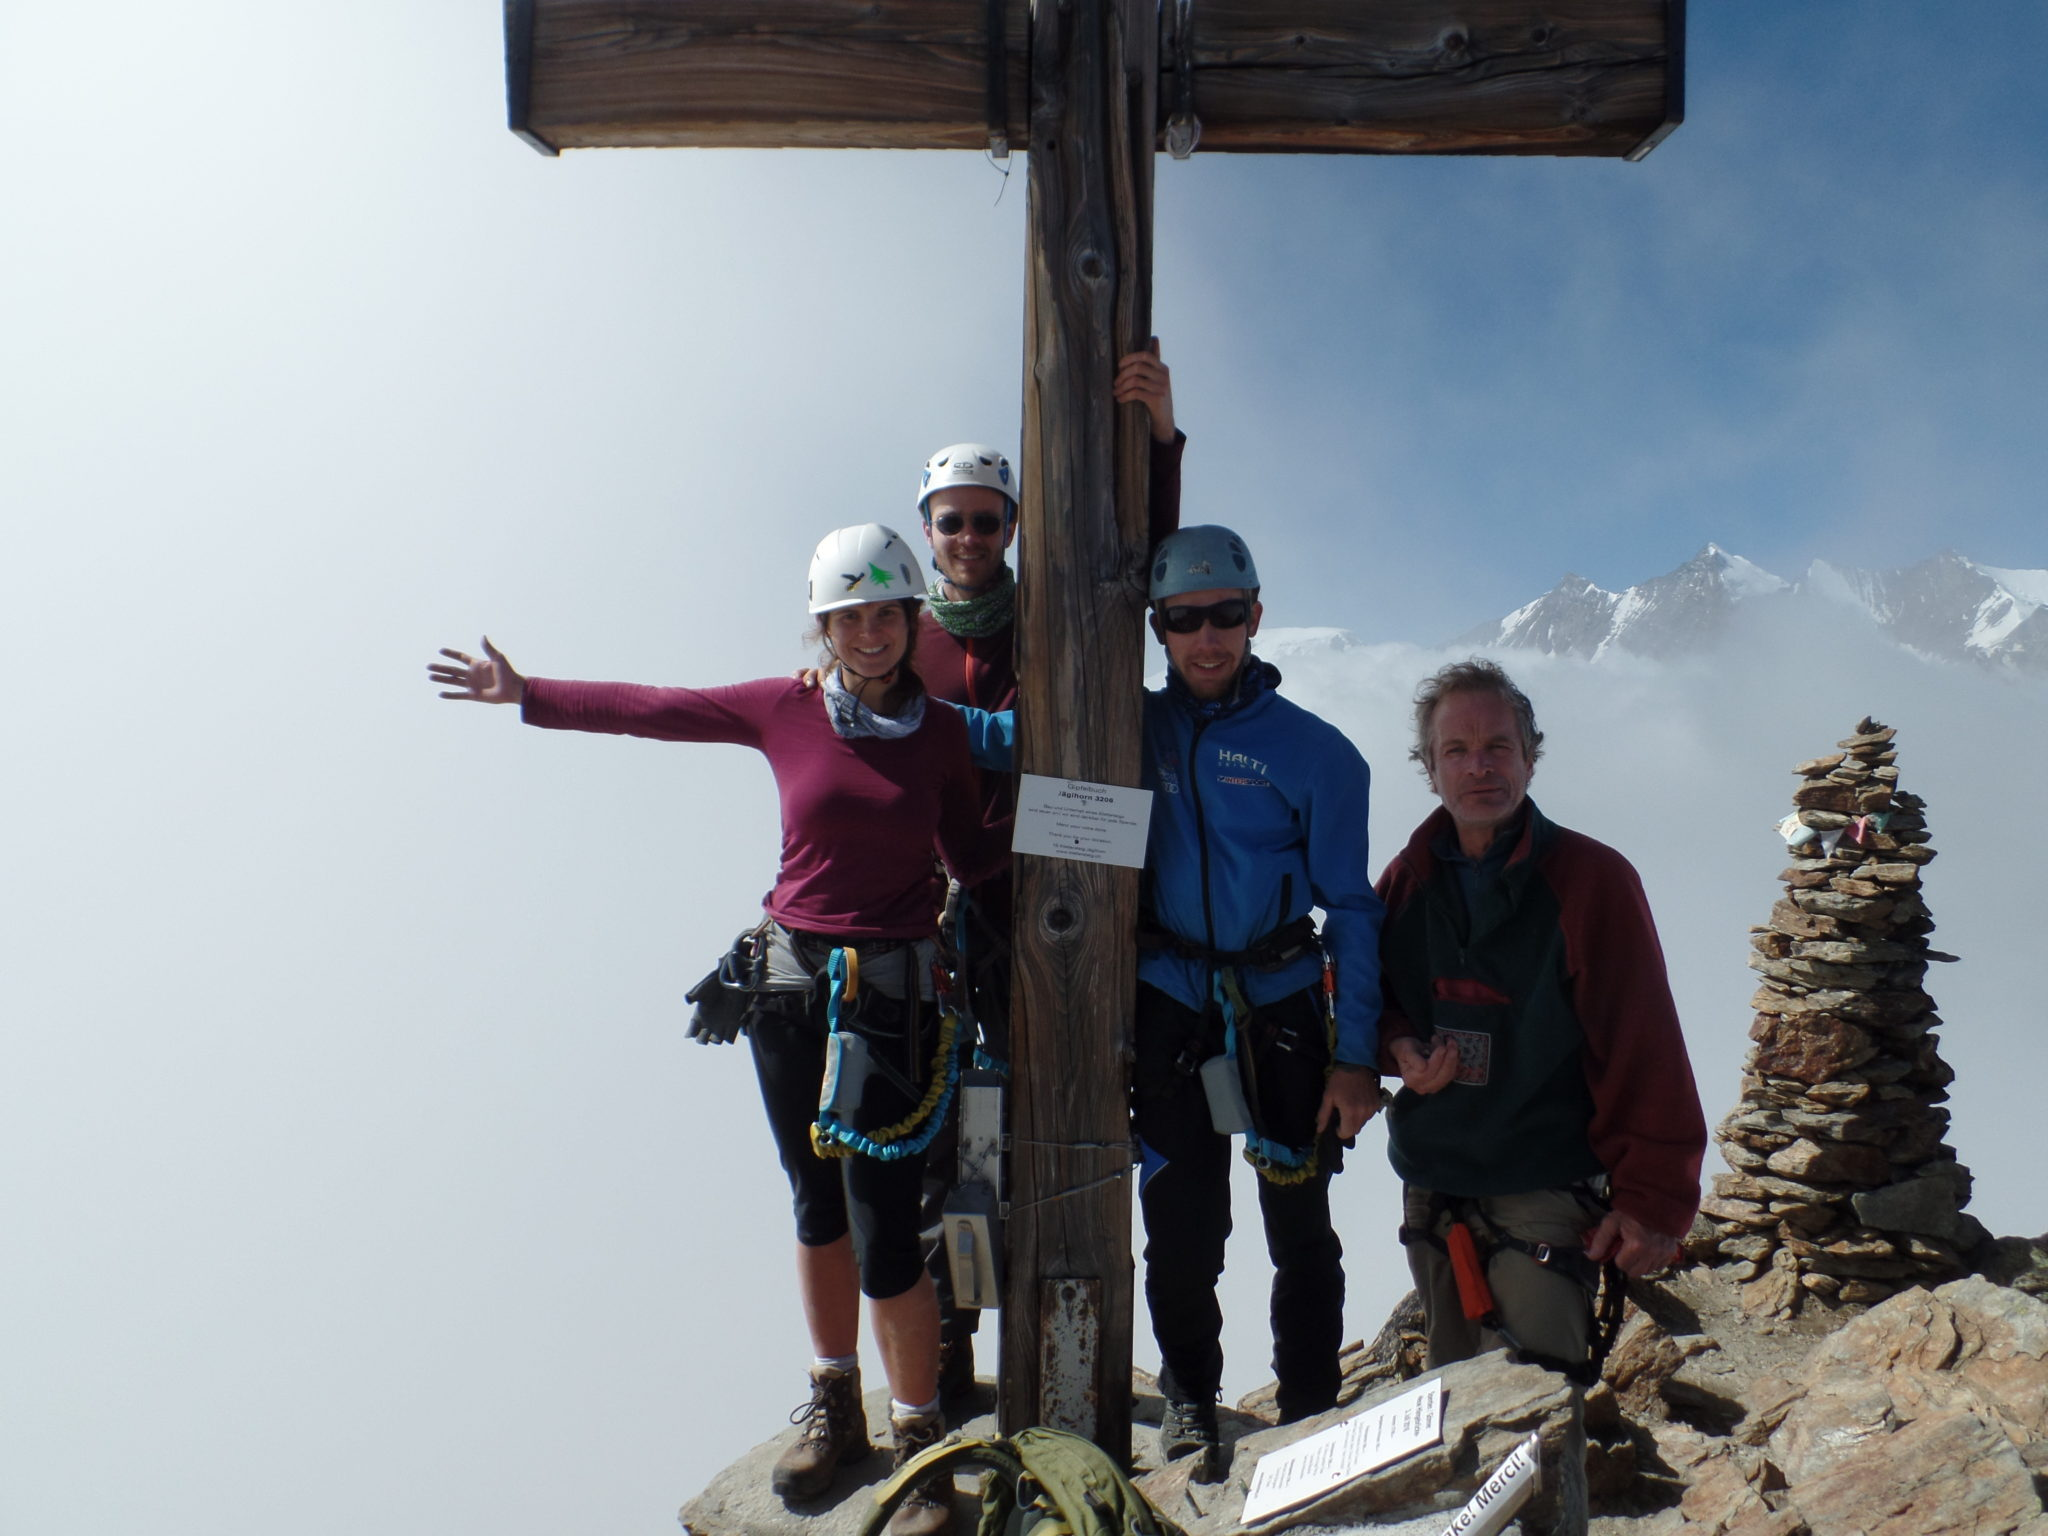 Klettersteig Basel : Klettersteig jägihorn 27. august 2016 u2013 aacbasel